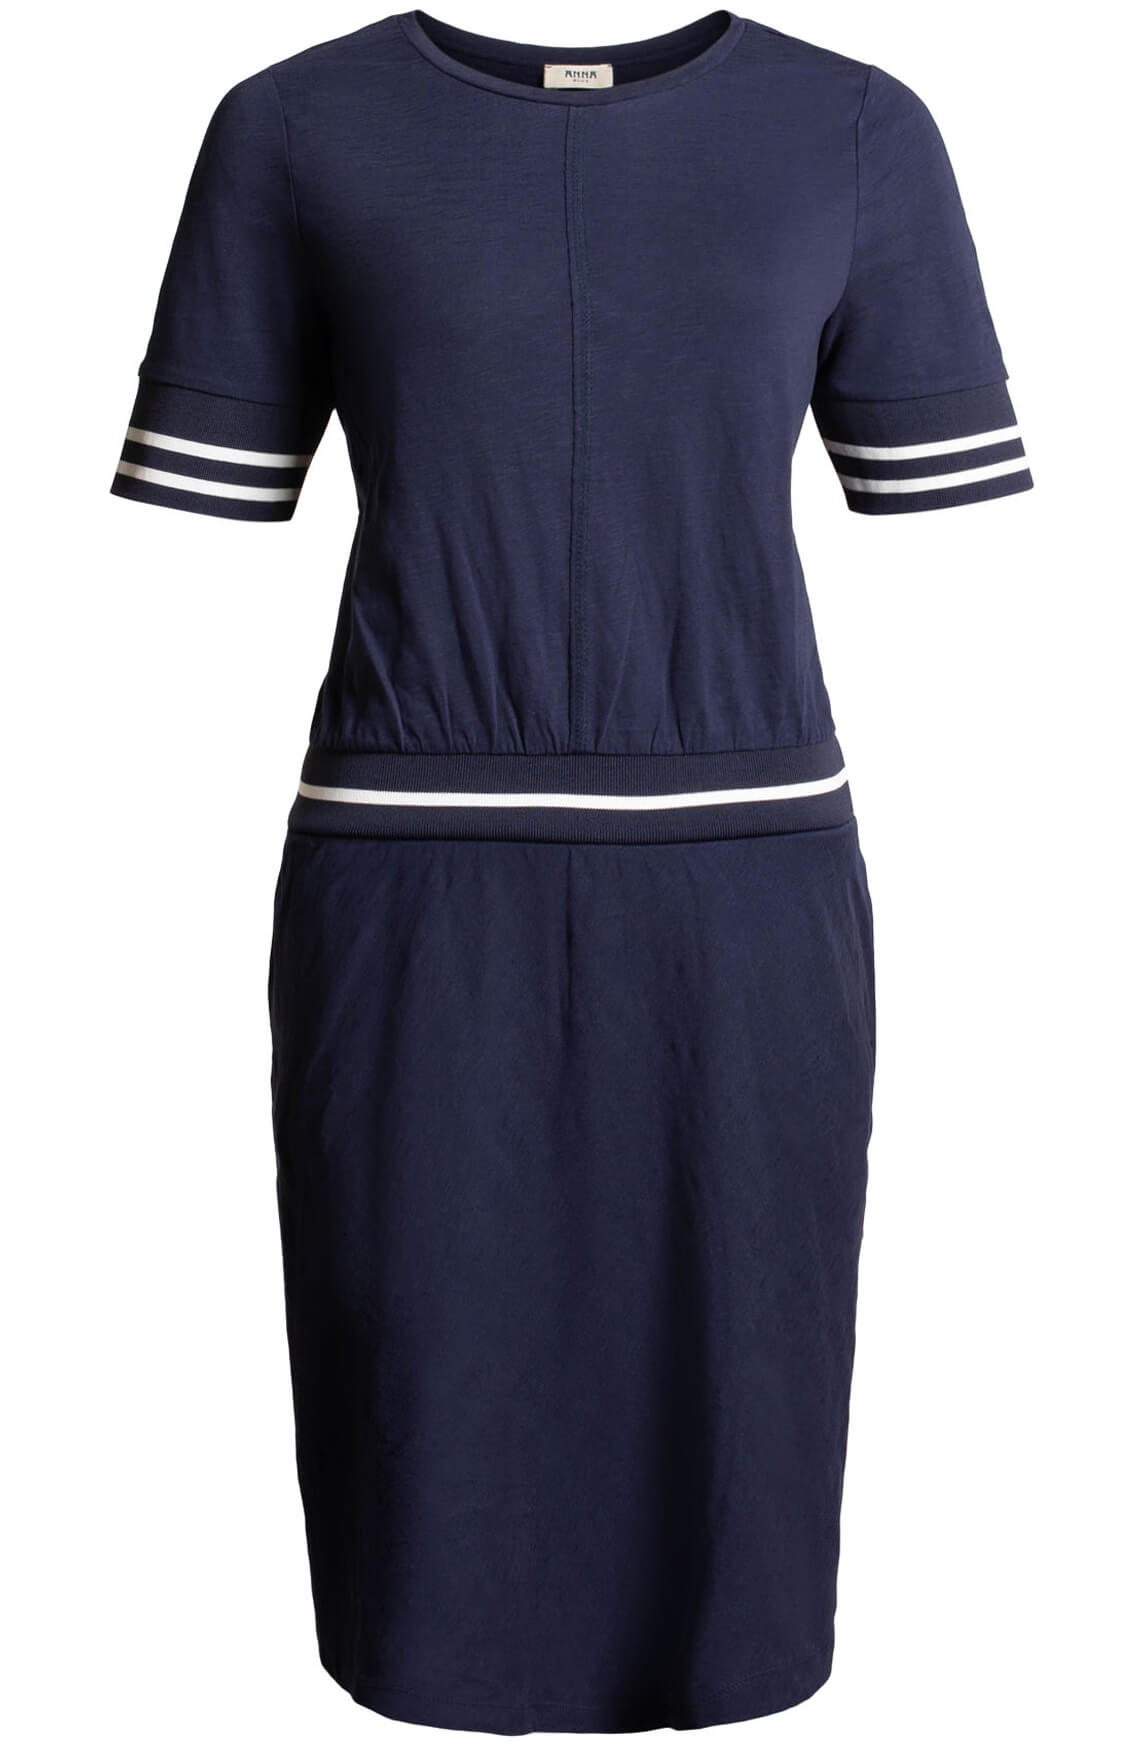 Anna Blue Dames Jurk met tailleband Blauw